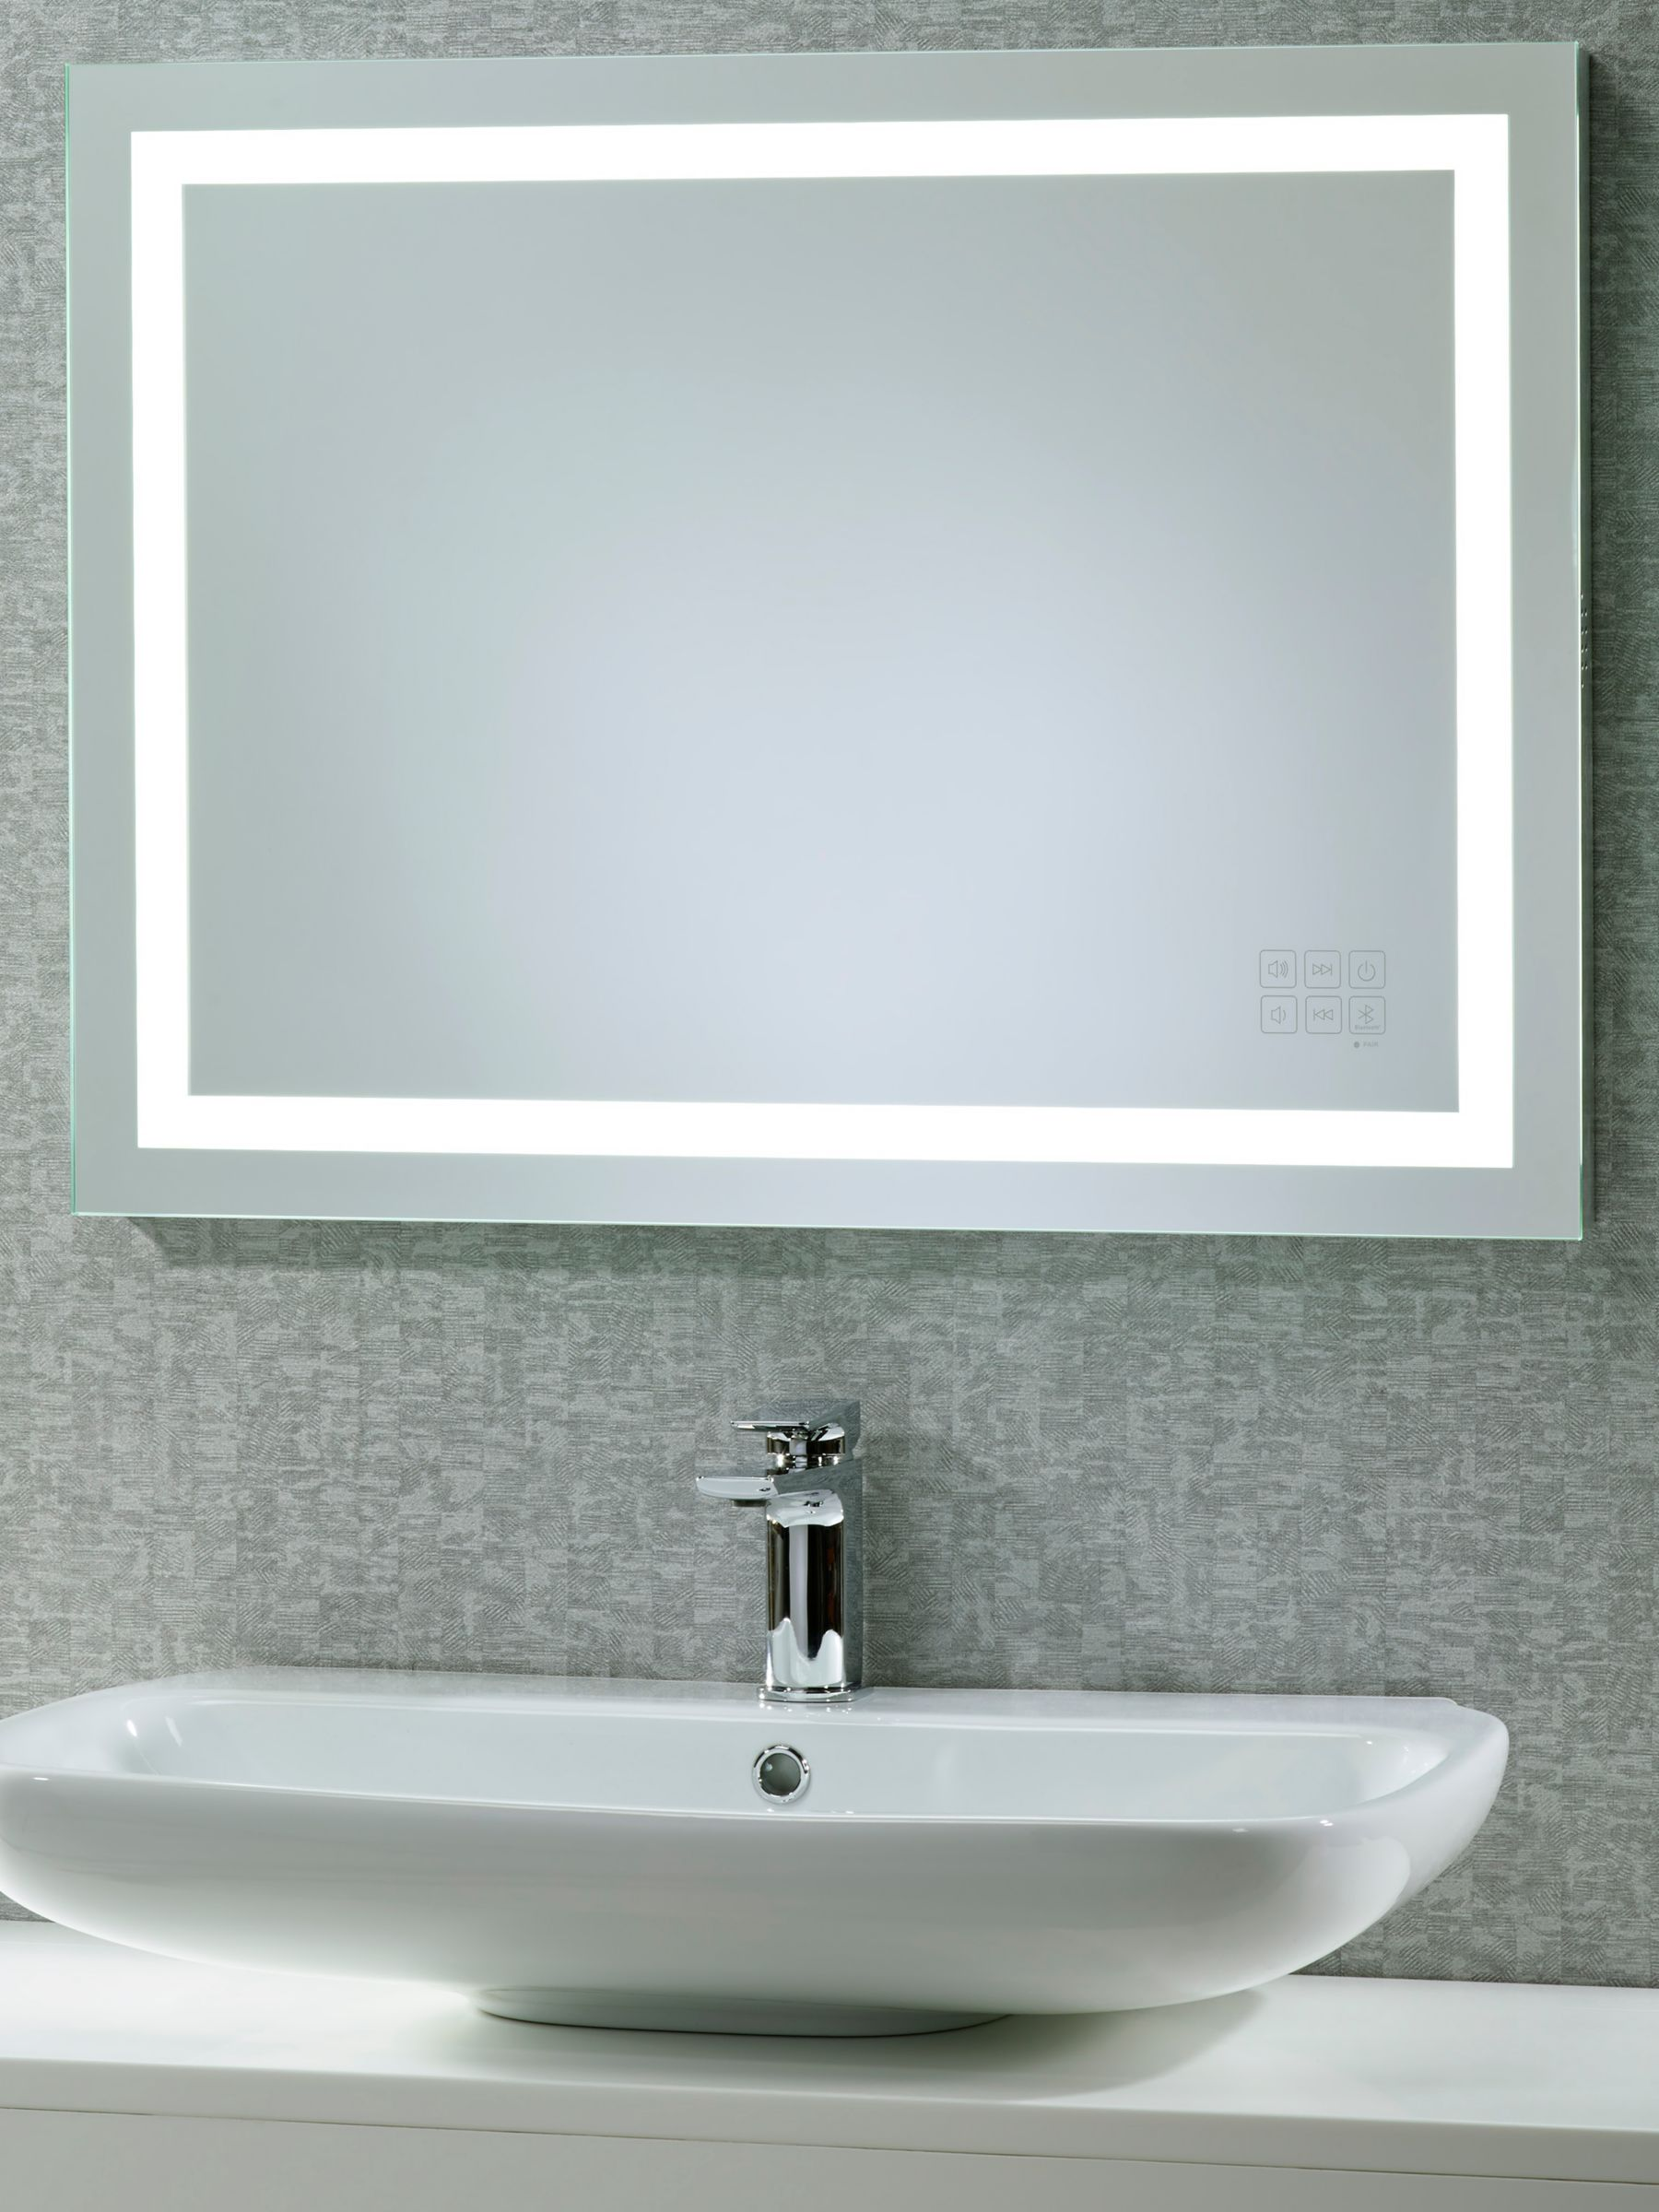 Buy Roper Rhodes Beat Illuminated Led Bathroom Mirror with